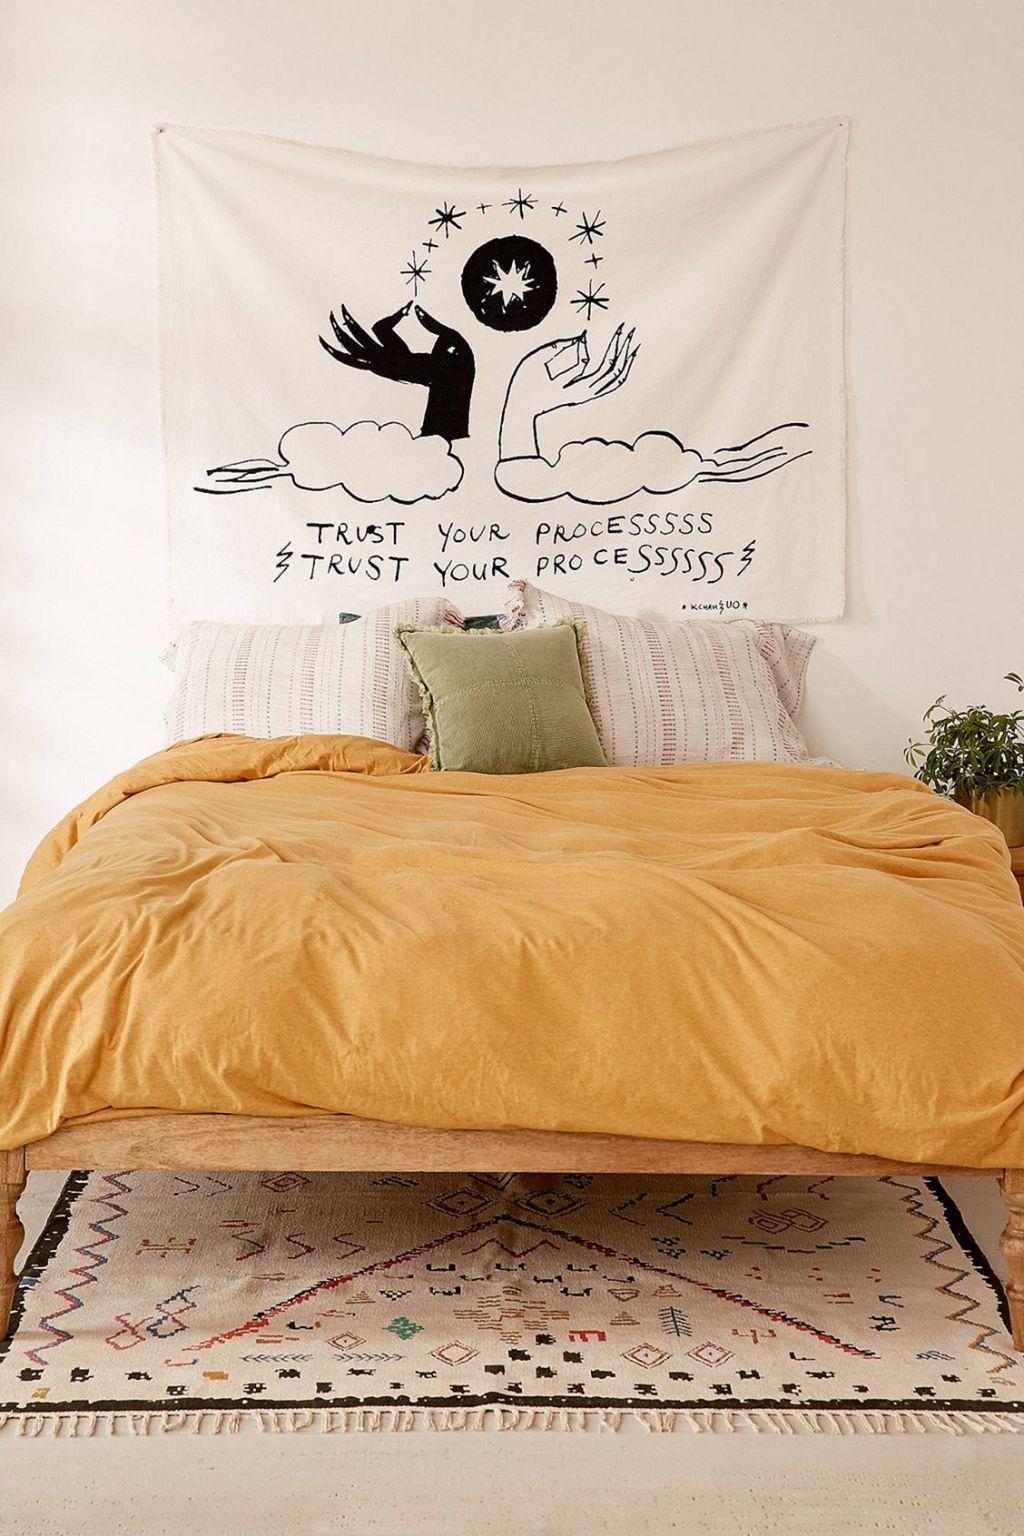 Incredible Yellow Aesthetic Bedroom Decorating Ideas 24 Room Inspiration Aesthetic Bedroom Bedroom Design Inspiration yellow aesthetic bedroom